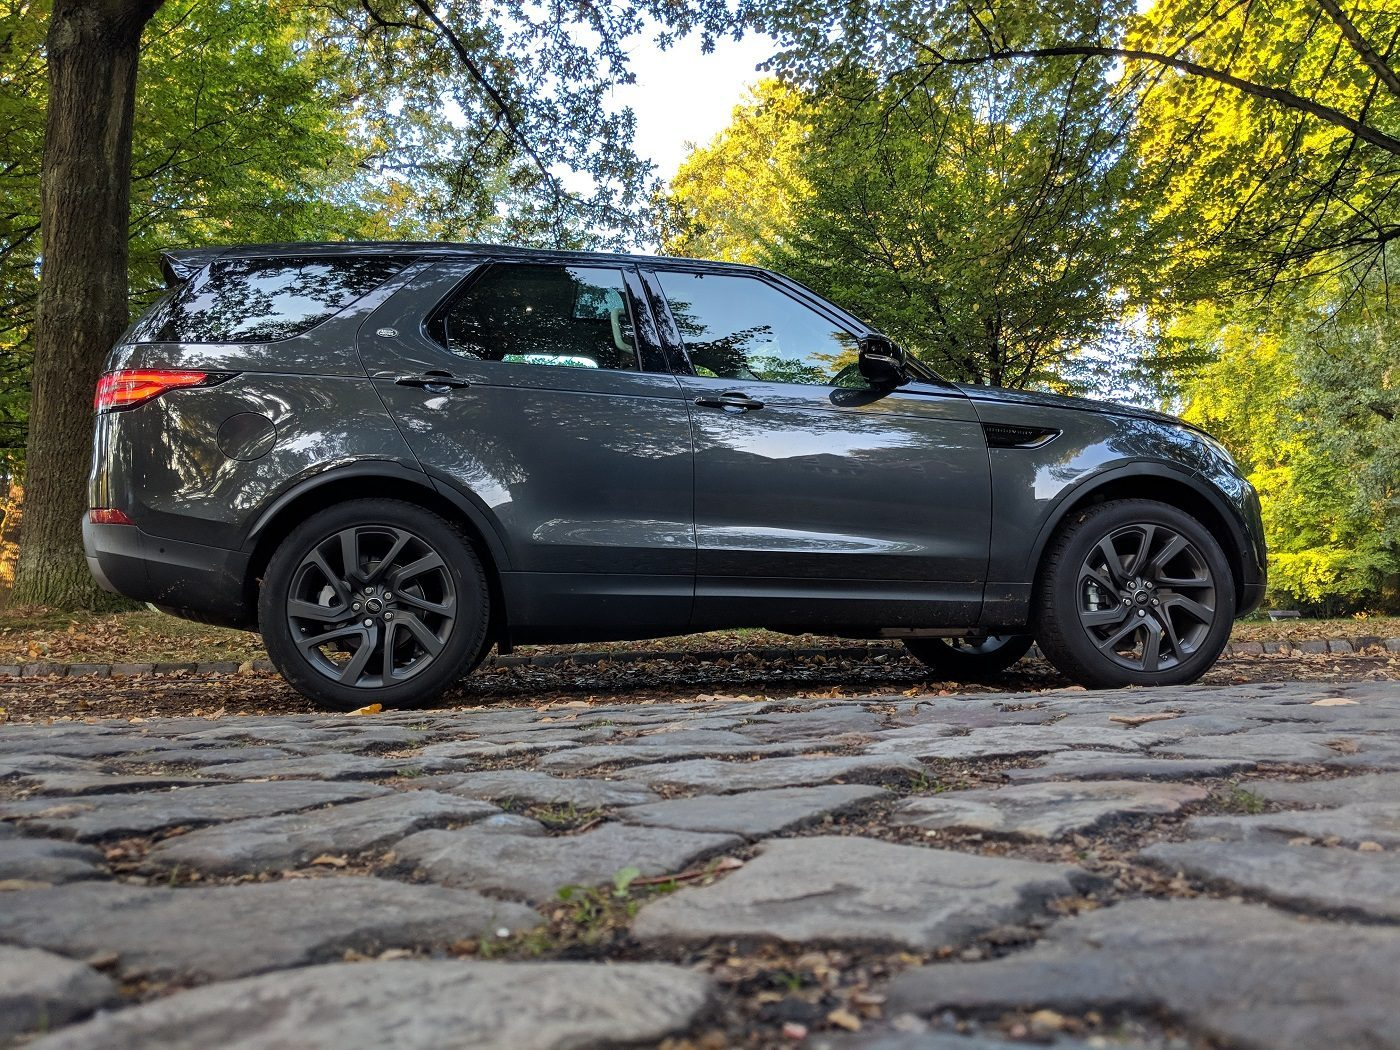 Land Rover Discovery 2018 Seitenansicht